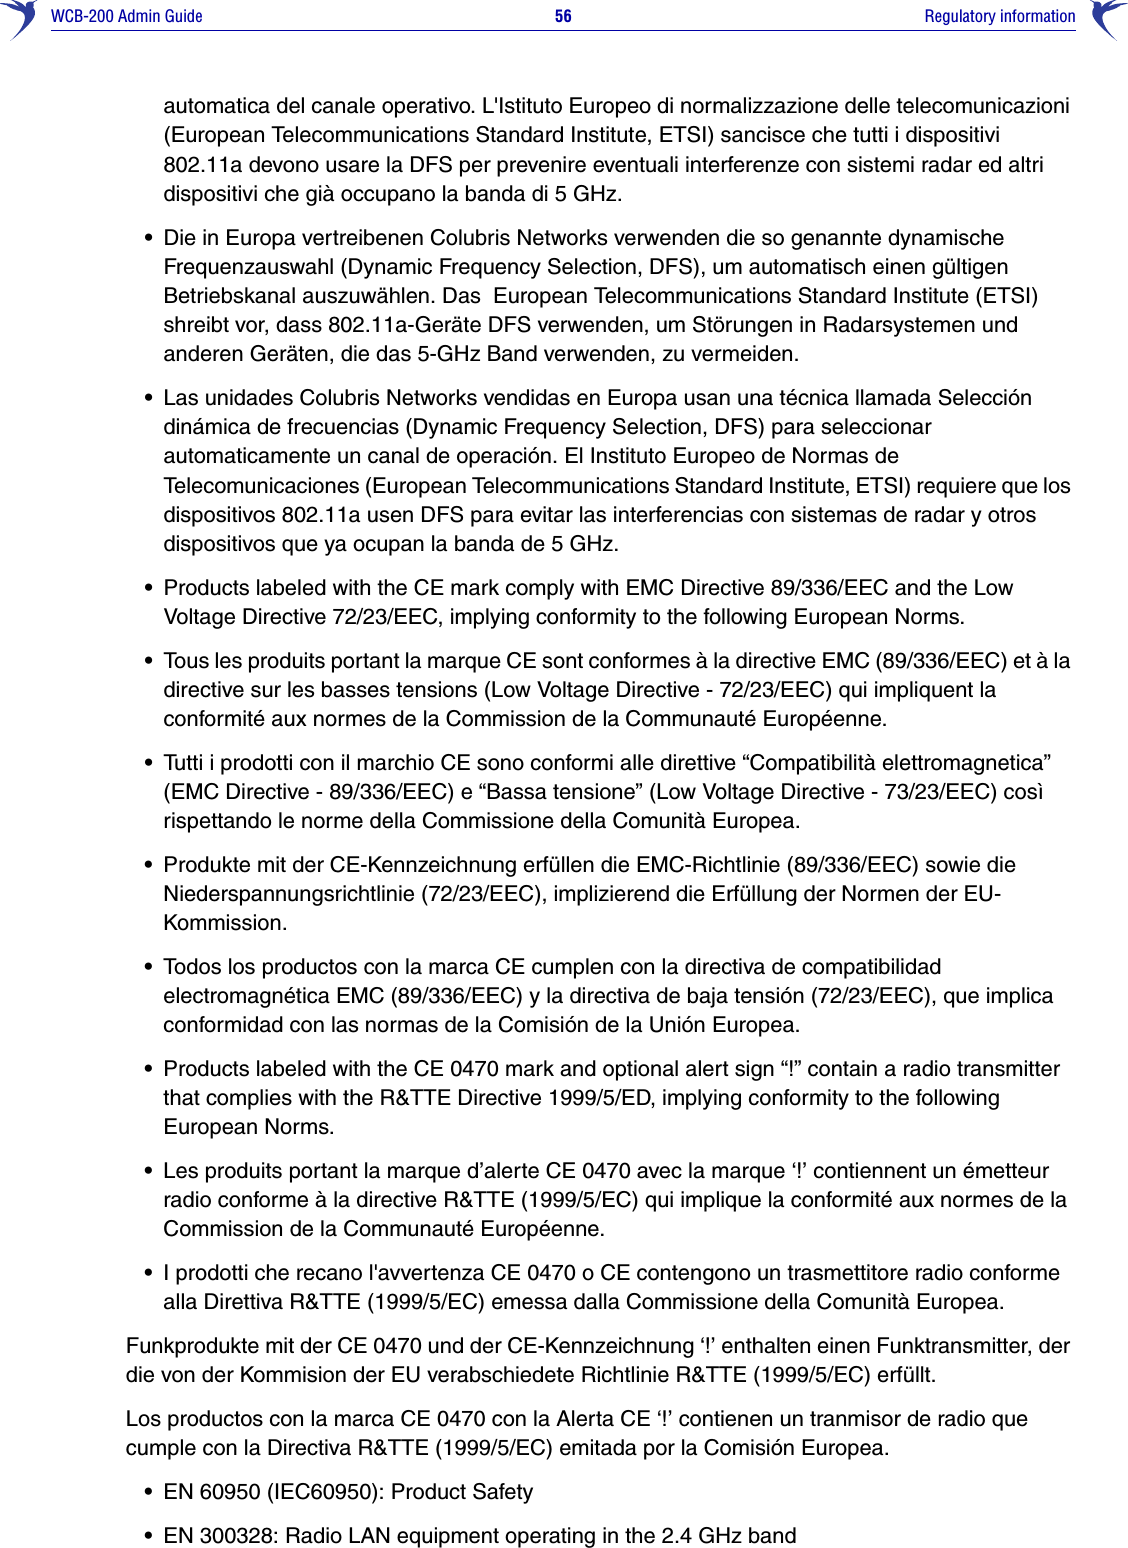 Hewlett Packard Enterprise WCB-200 Wireless Client Bridge